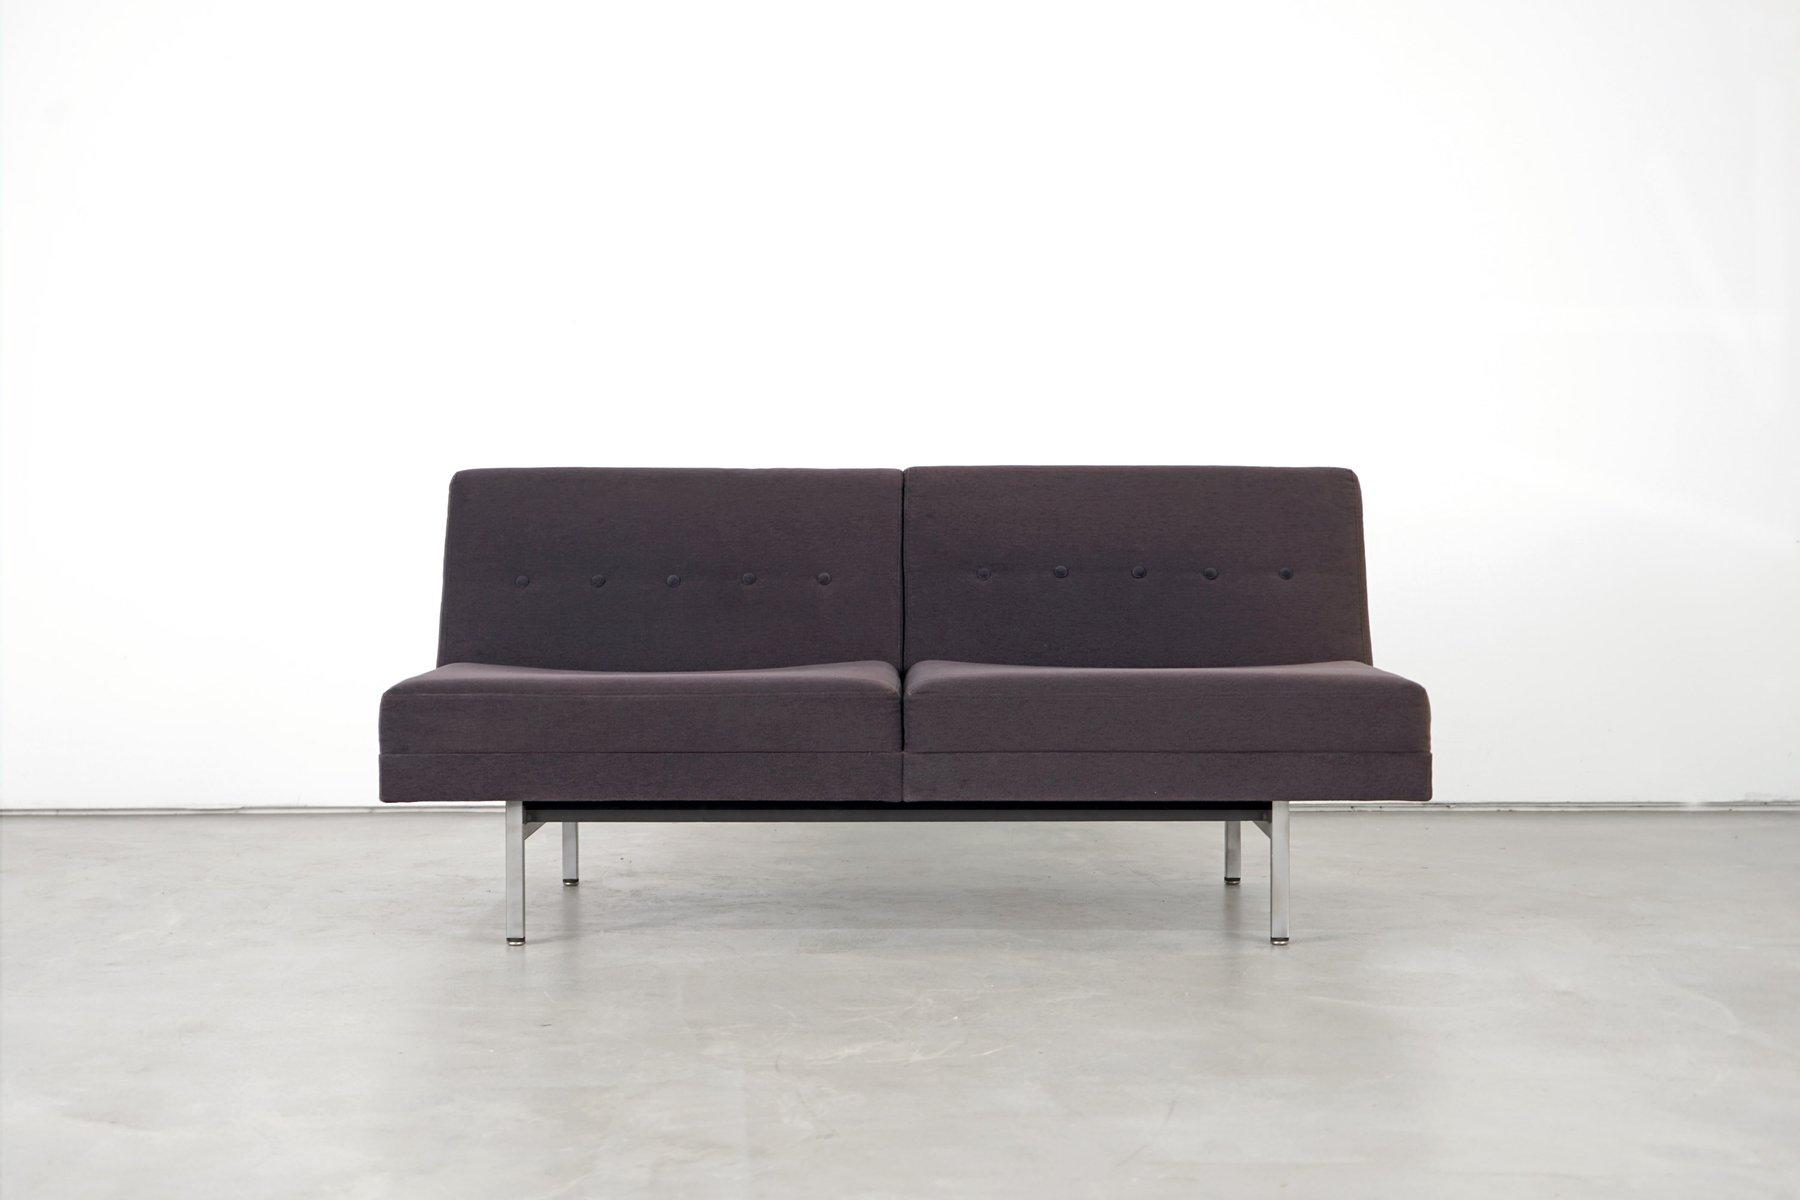 Innentren Gnstig. Finest Full Size Of Modernes Interieur Wandfarbe